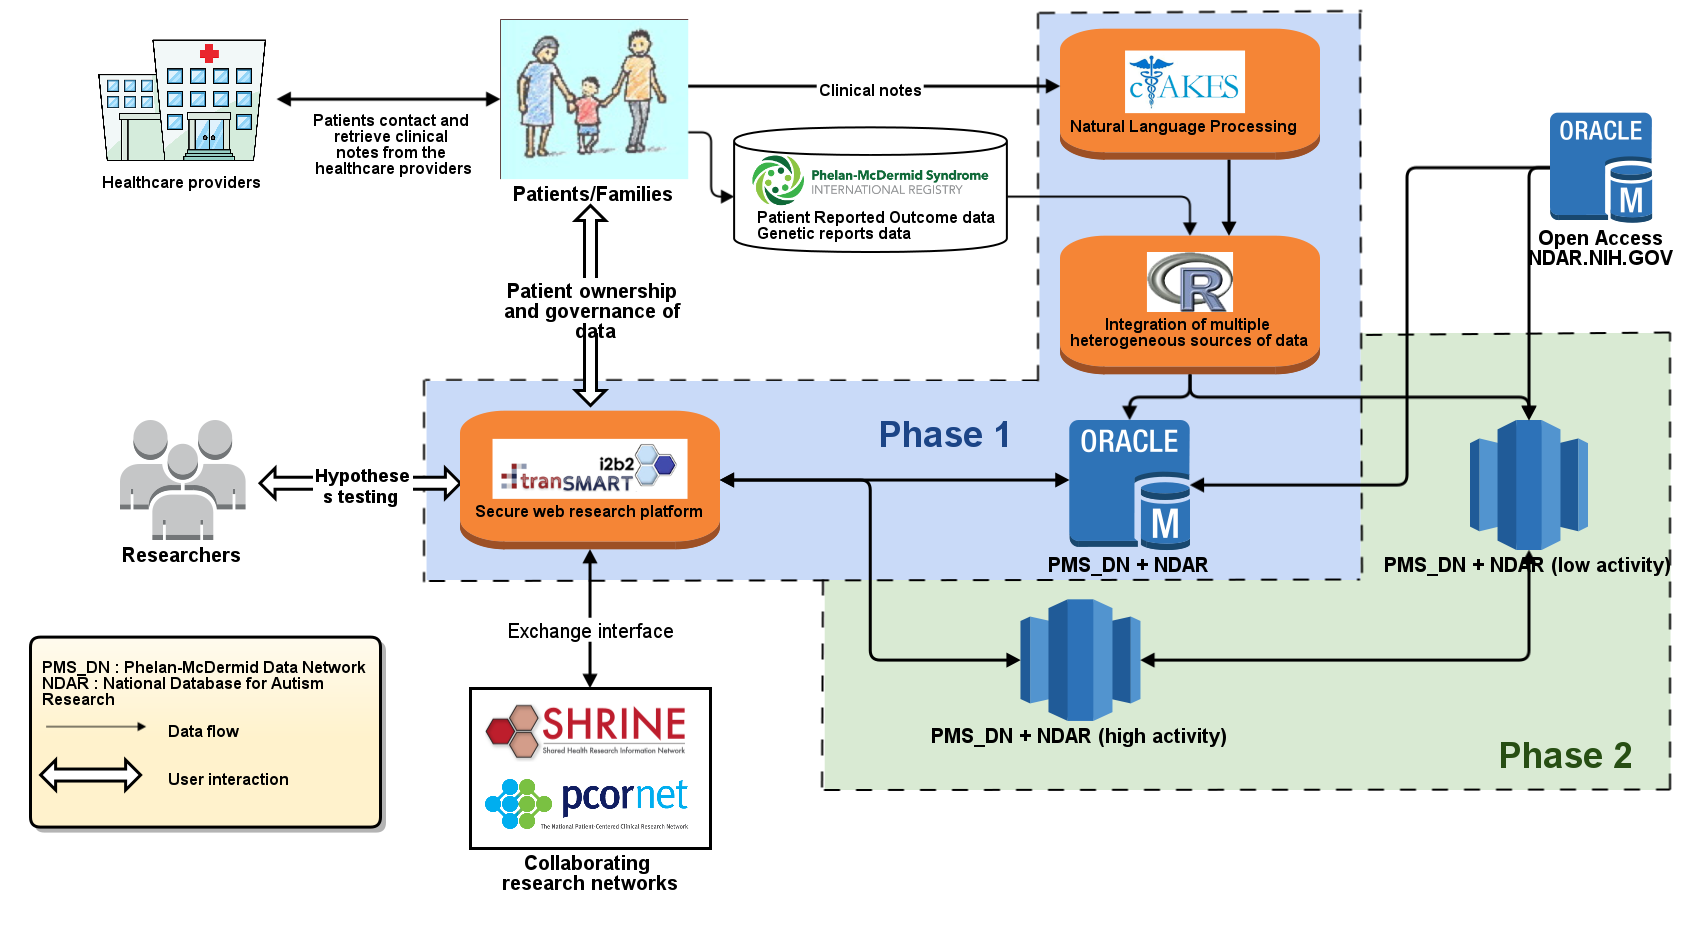 AWS - tranSMART pilot study on the cloud using Redshift